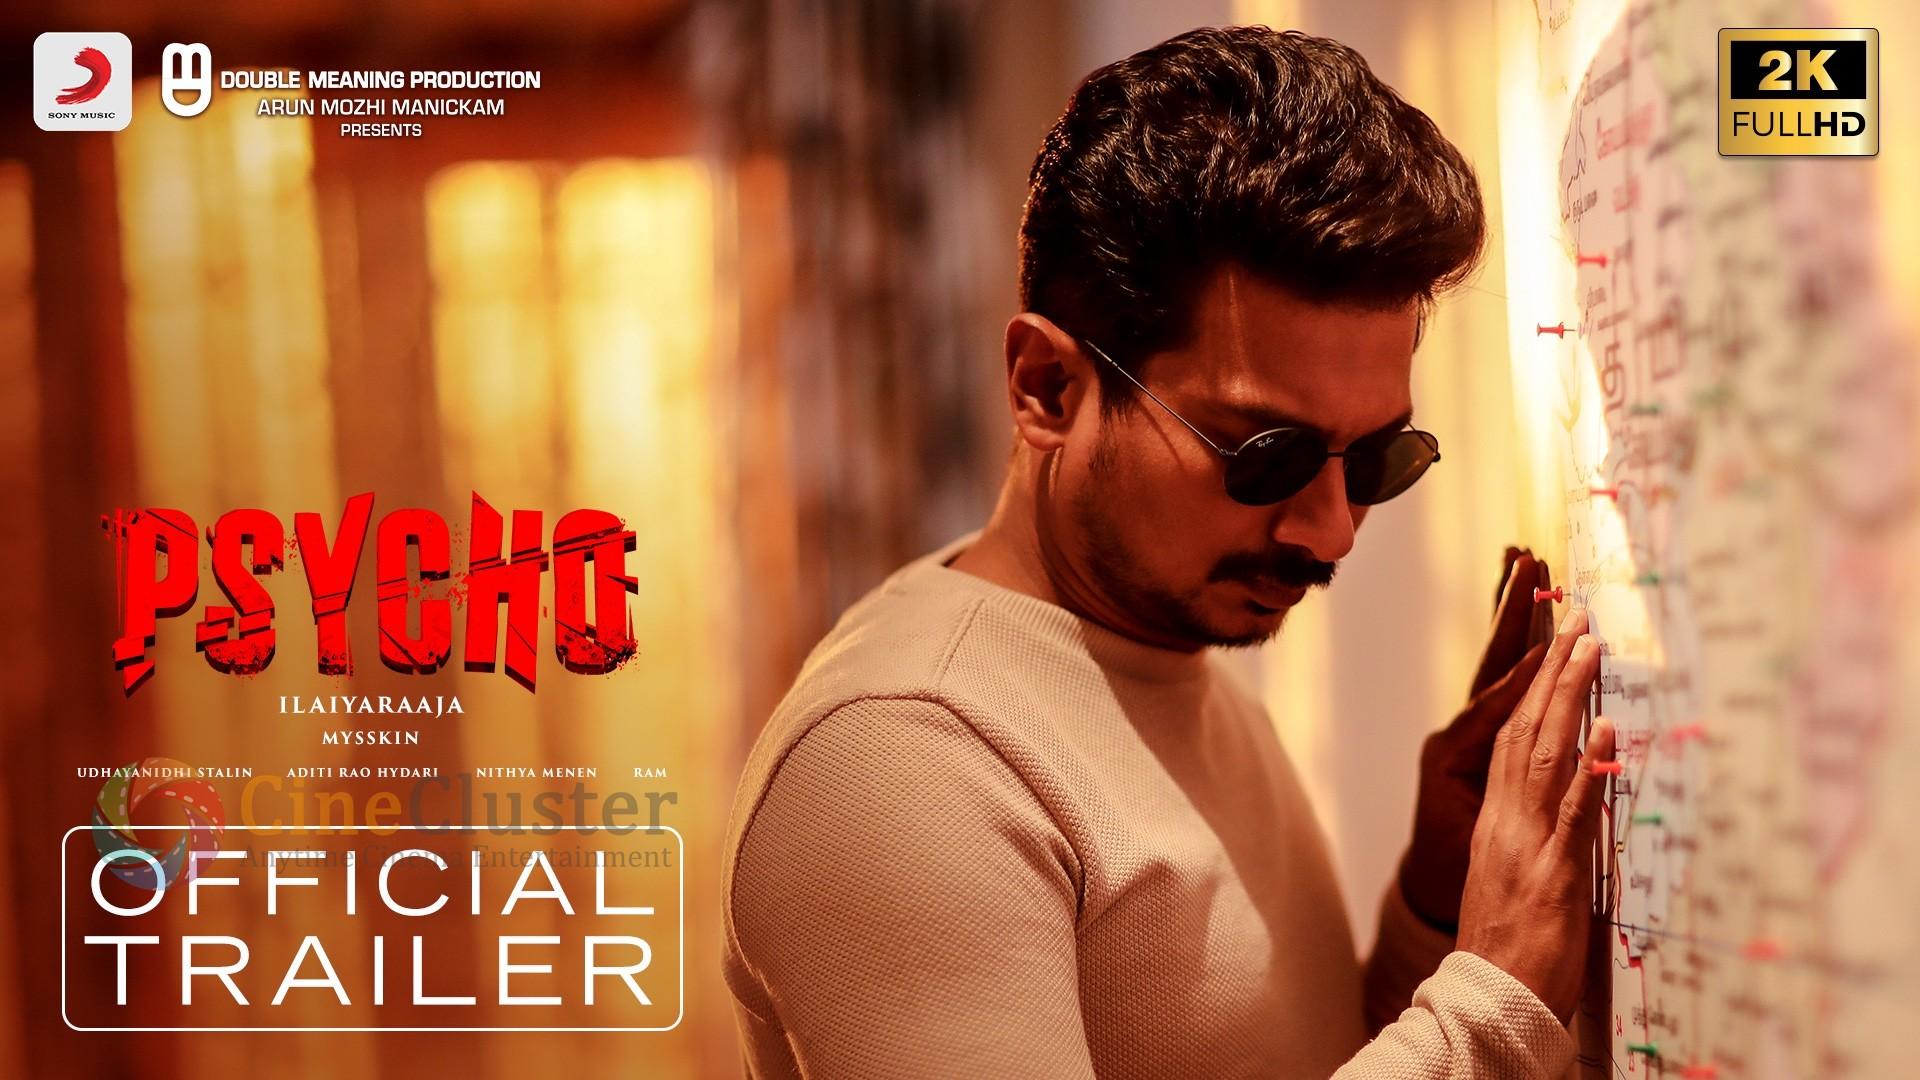 Psycho Trailer (Tamil)